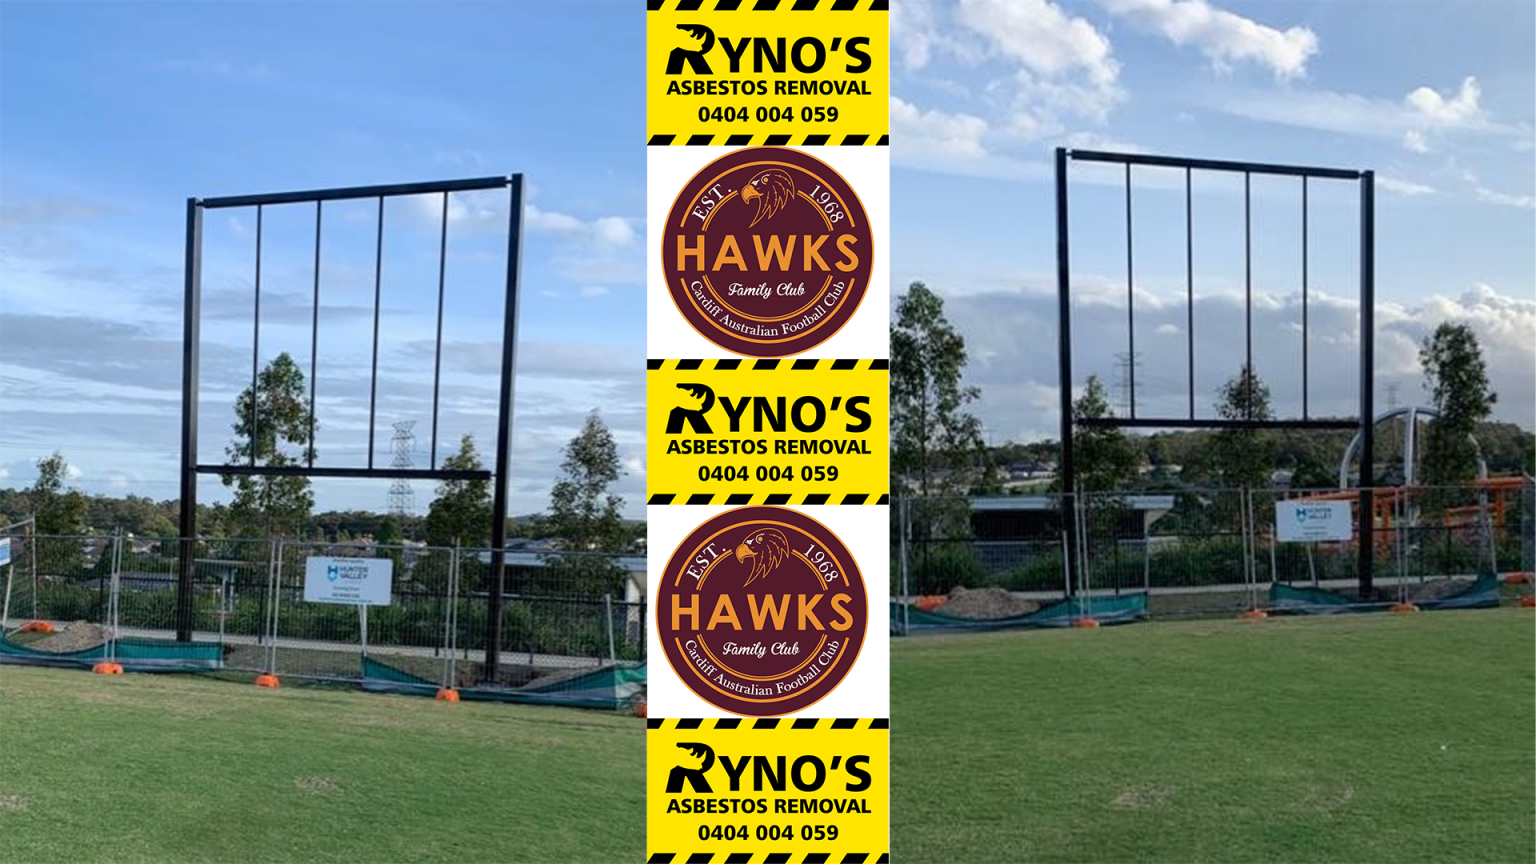 photos of new scoredboard erected, with sponsor Ryno's logo